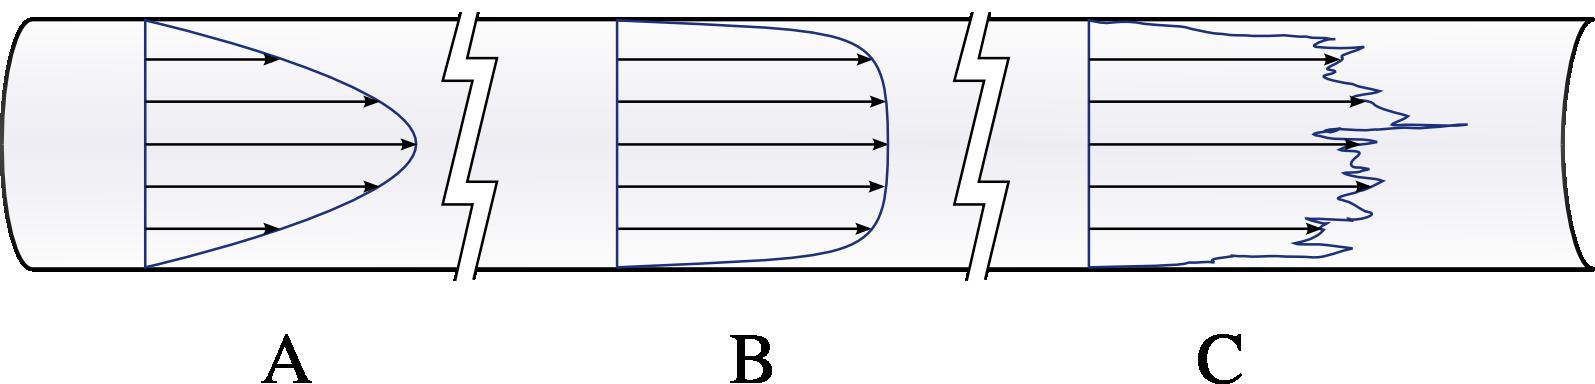 7/images/velocity_distributions_laminar_turbulent.png